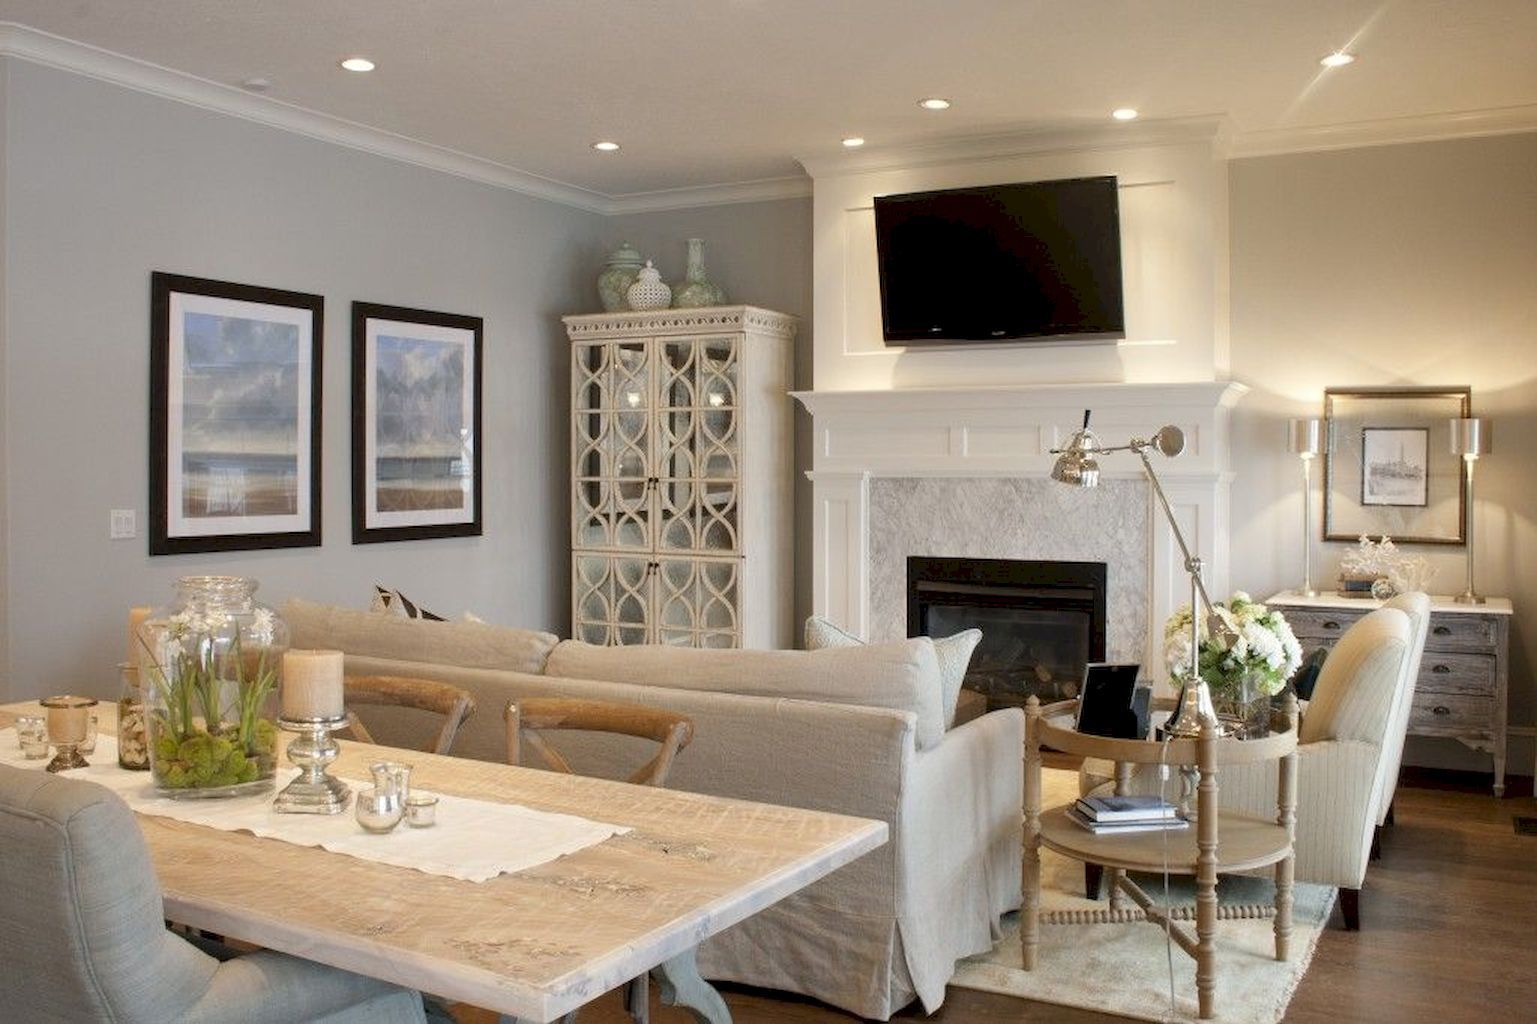 Marvelous Design Space Saving Dining Room For Your Apartment Https Hometoz Com Design Living Room Dining Room Combo Rectangle Living Room Small Living Dining